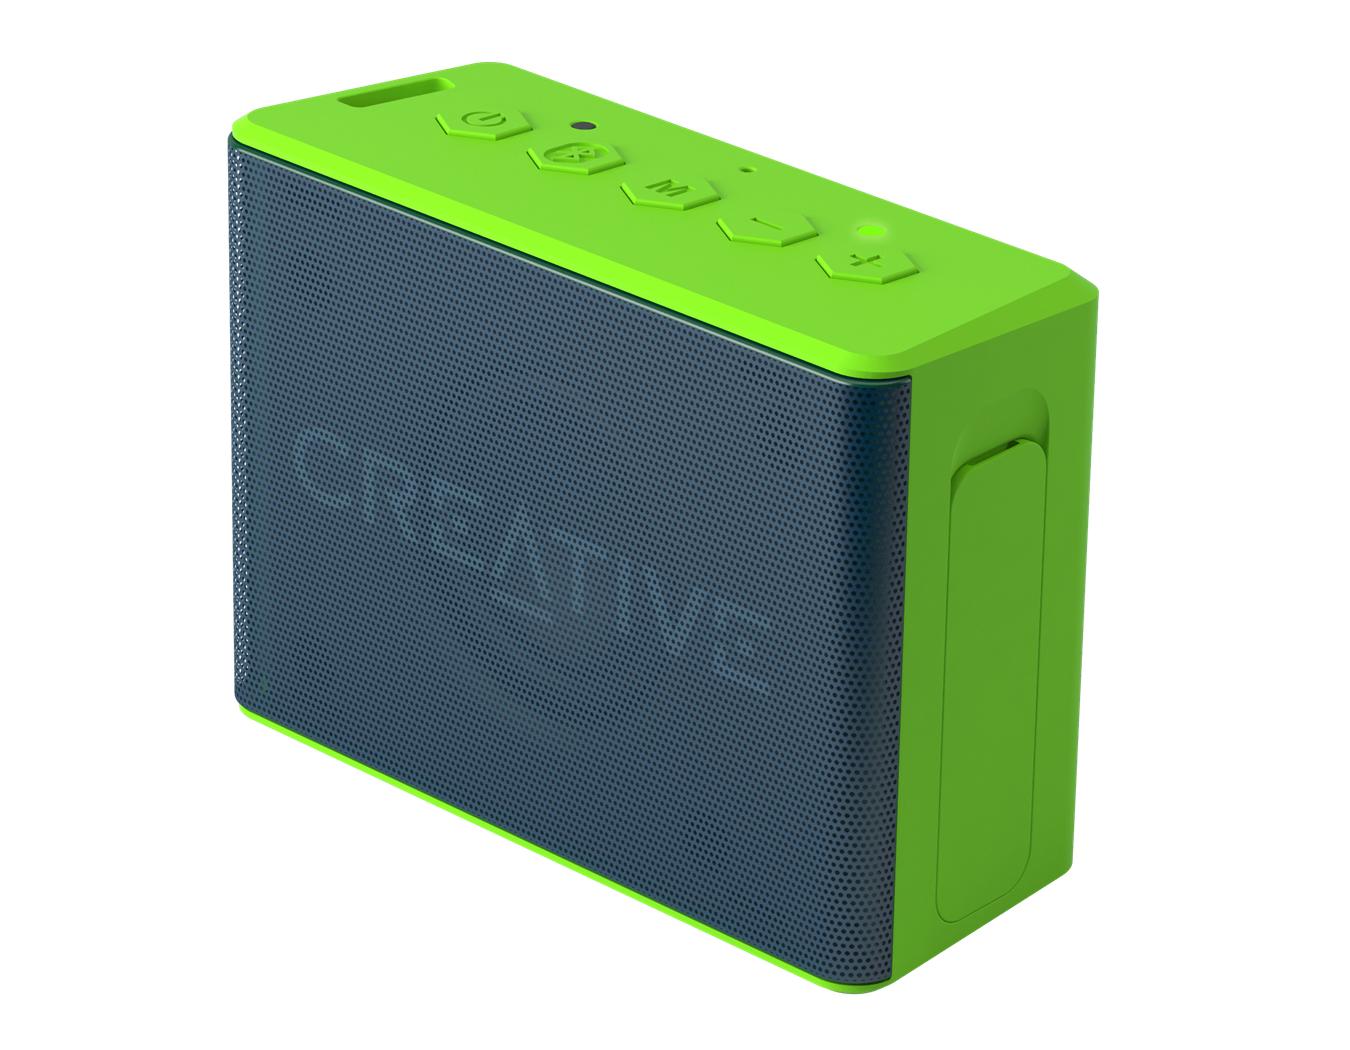 CREATIVE LABS 51MF8250AA003 MUVO 2C STEREO PORTABLE SPEAKER GREEN